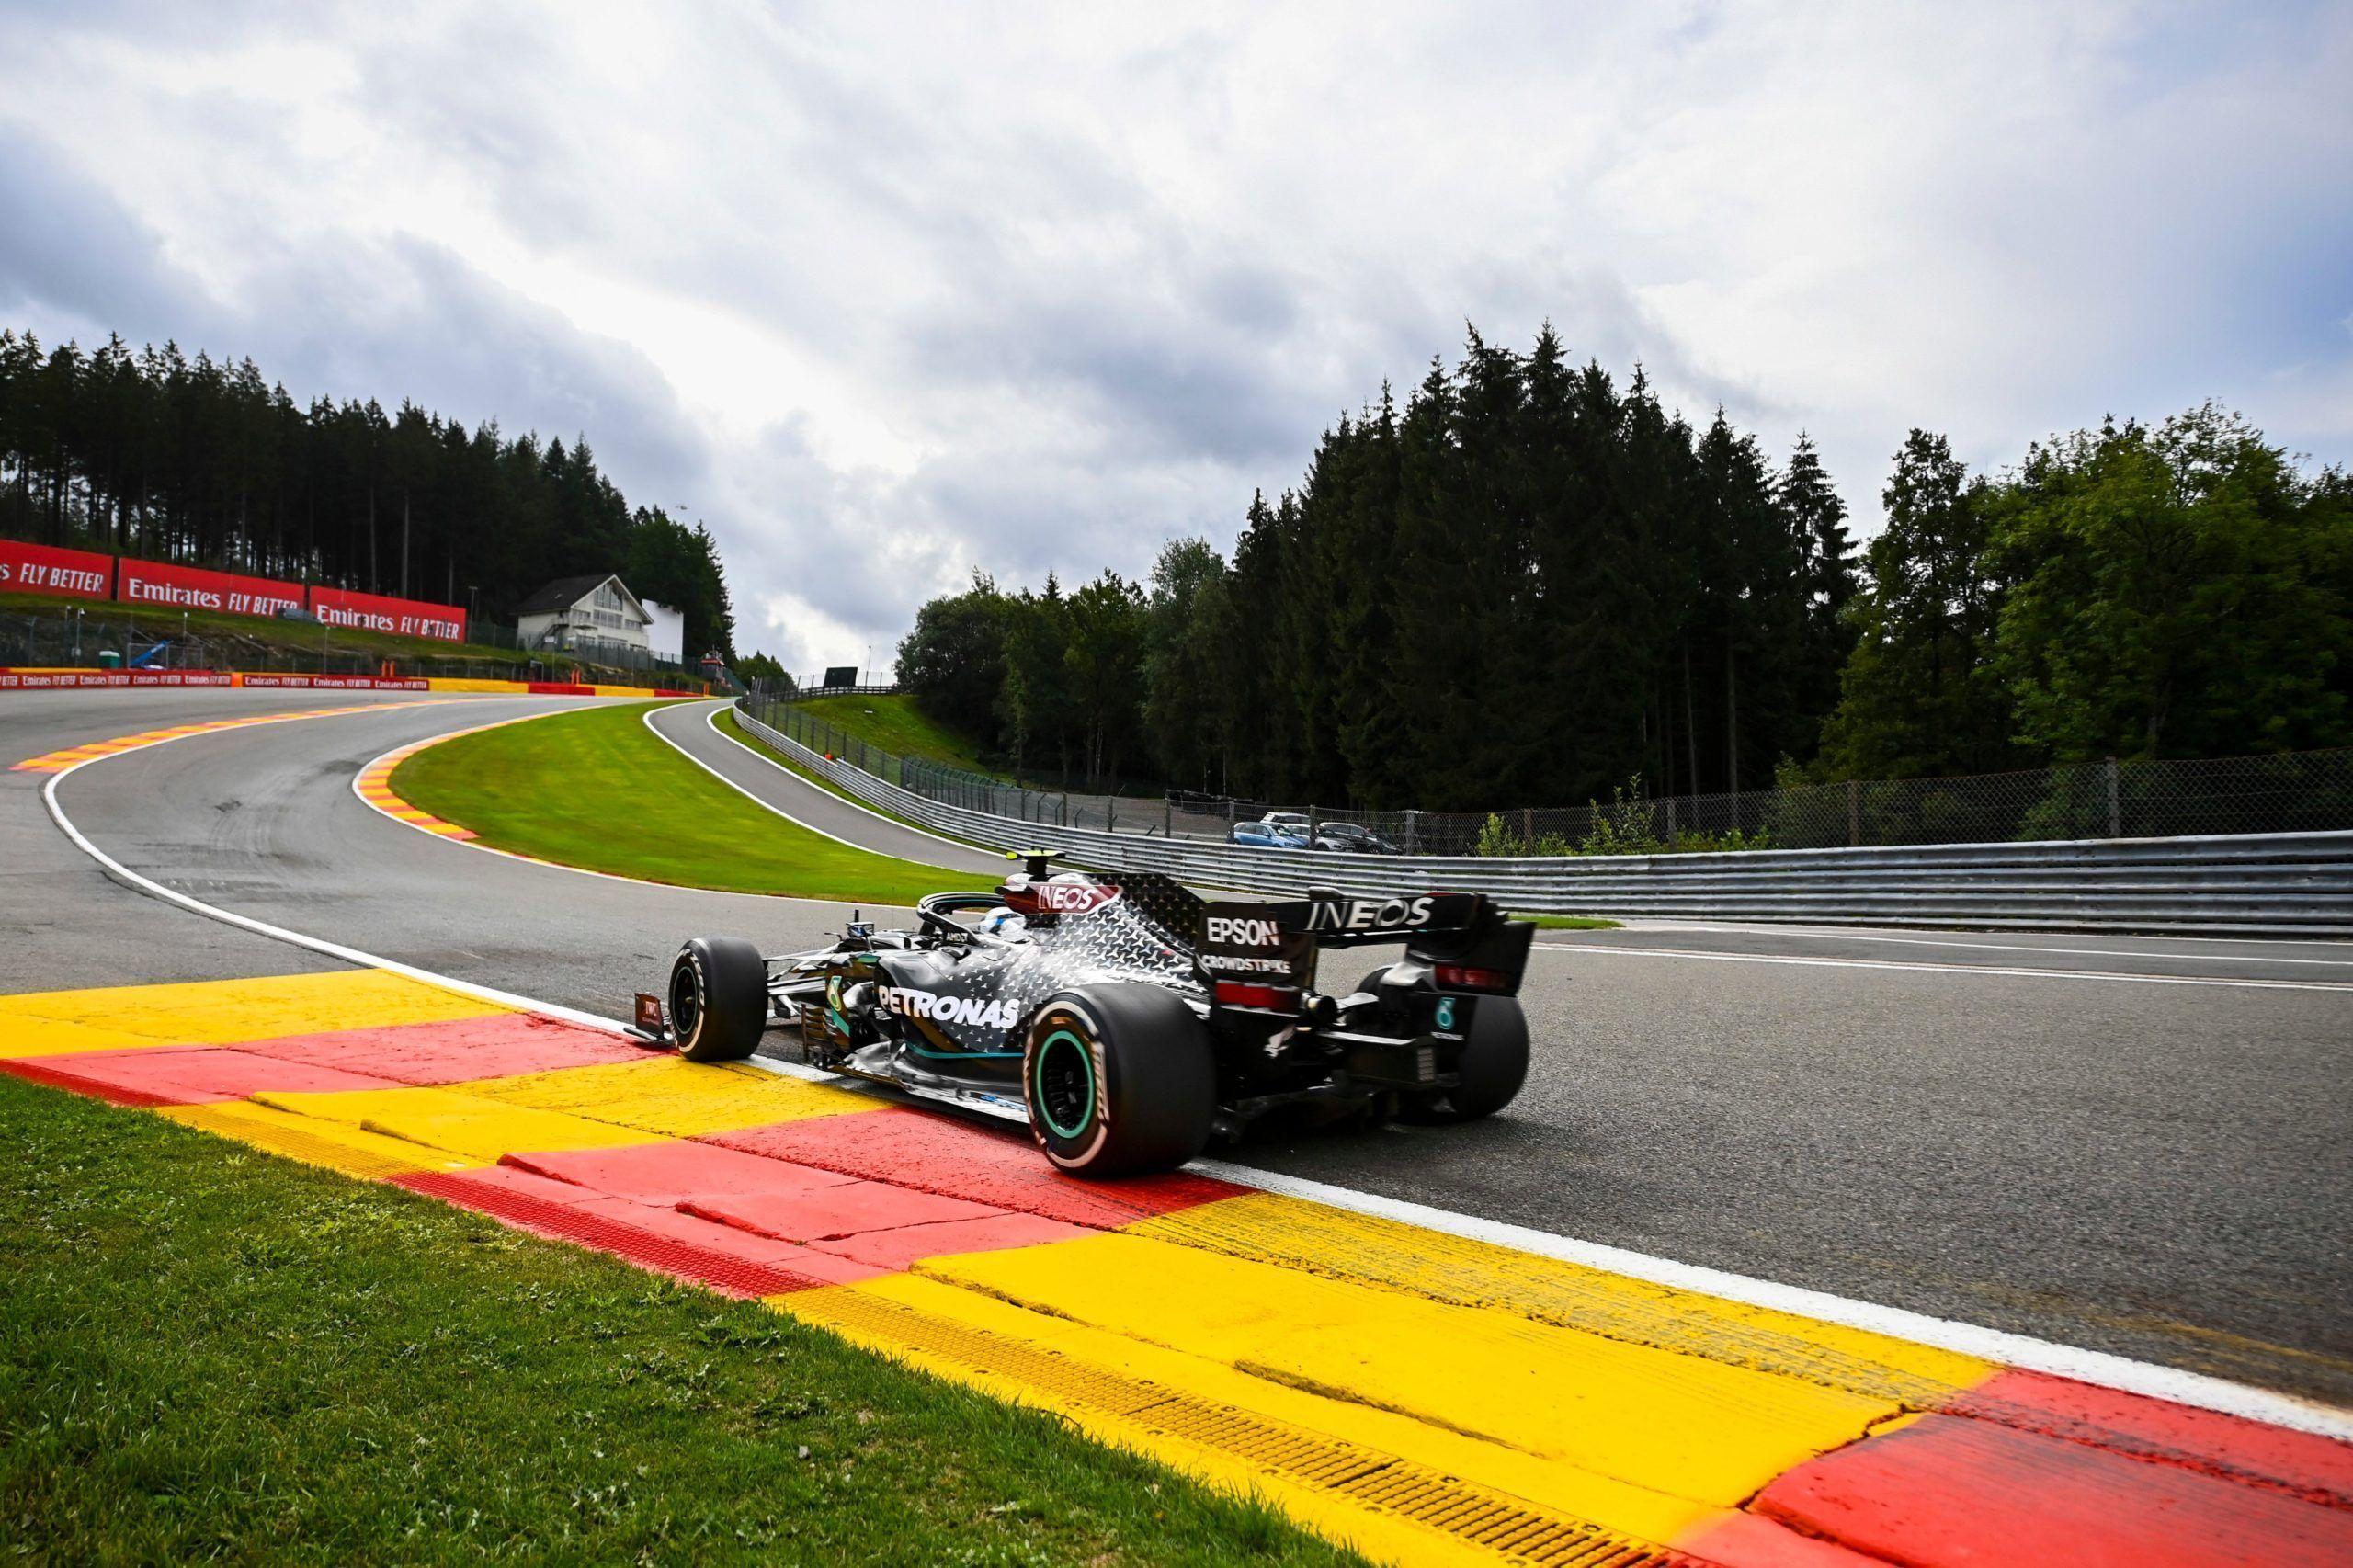 Belgian GP, Valtteri Bottas, F1